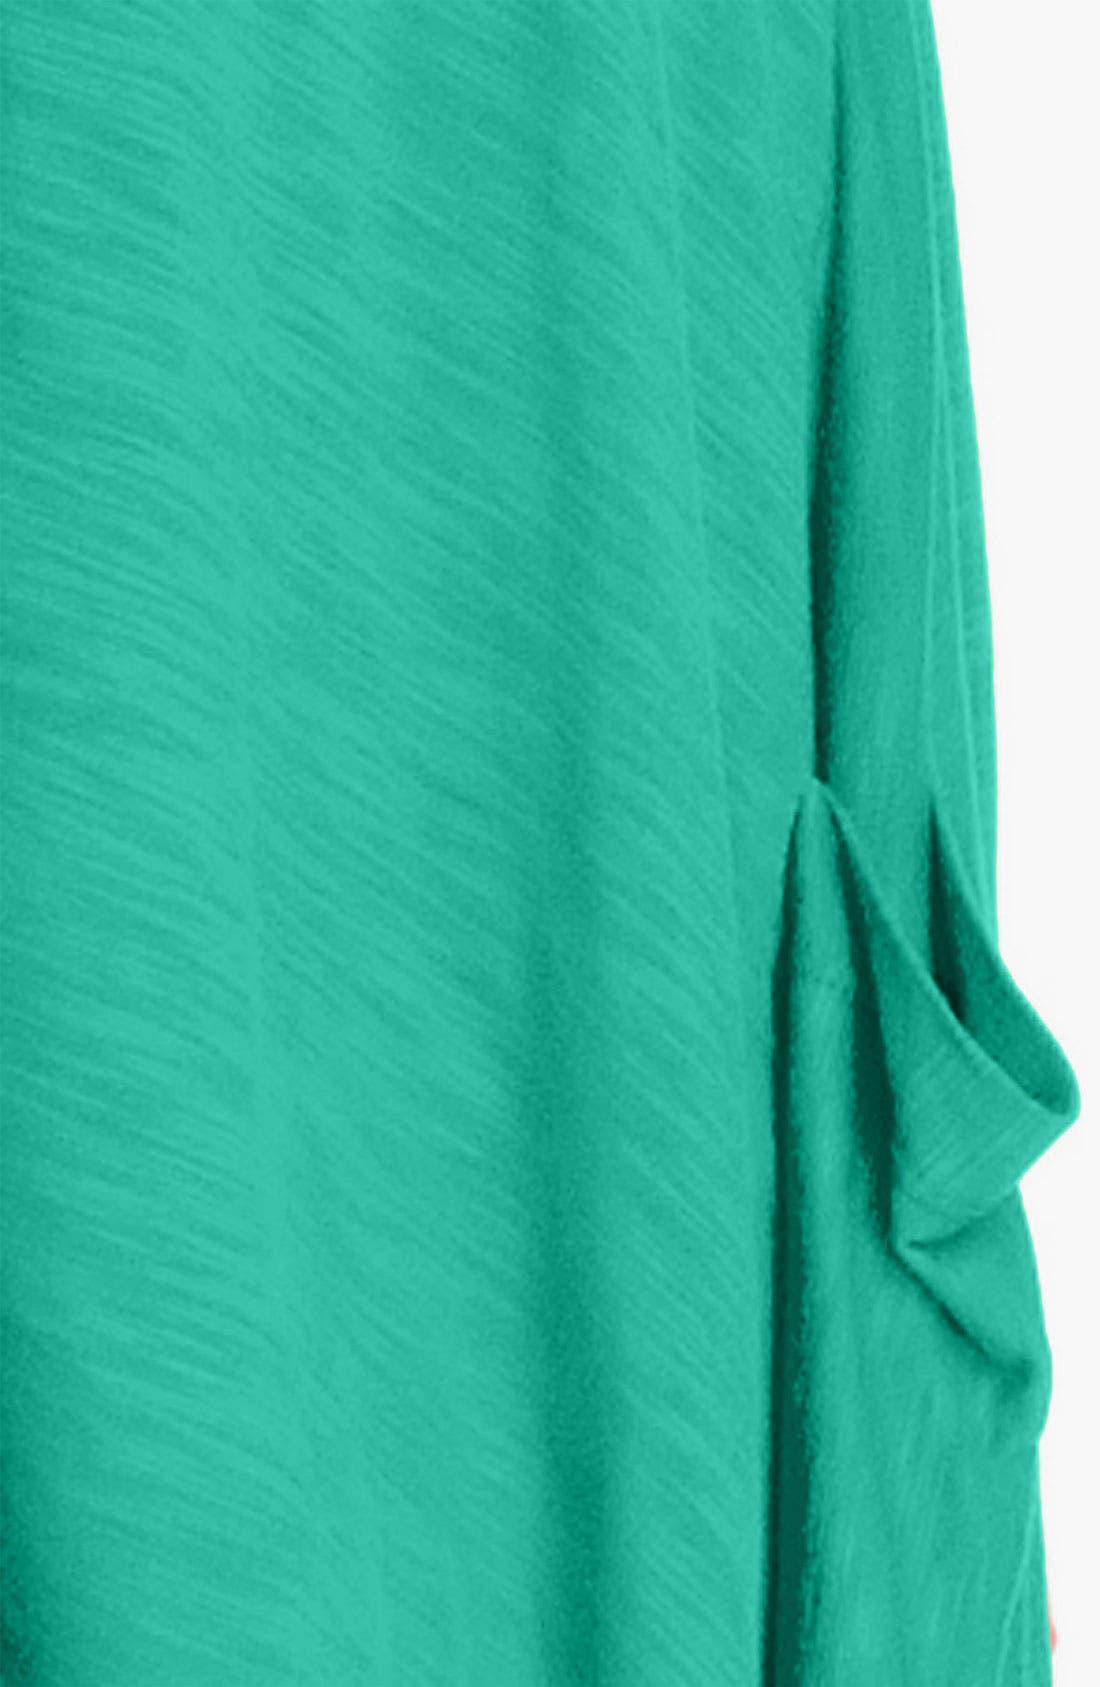 Alternate Image 3  - Elan 'Handkerchief' Cover-Up Dress